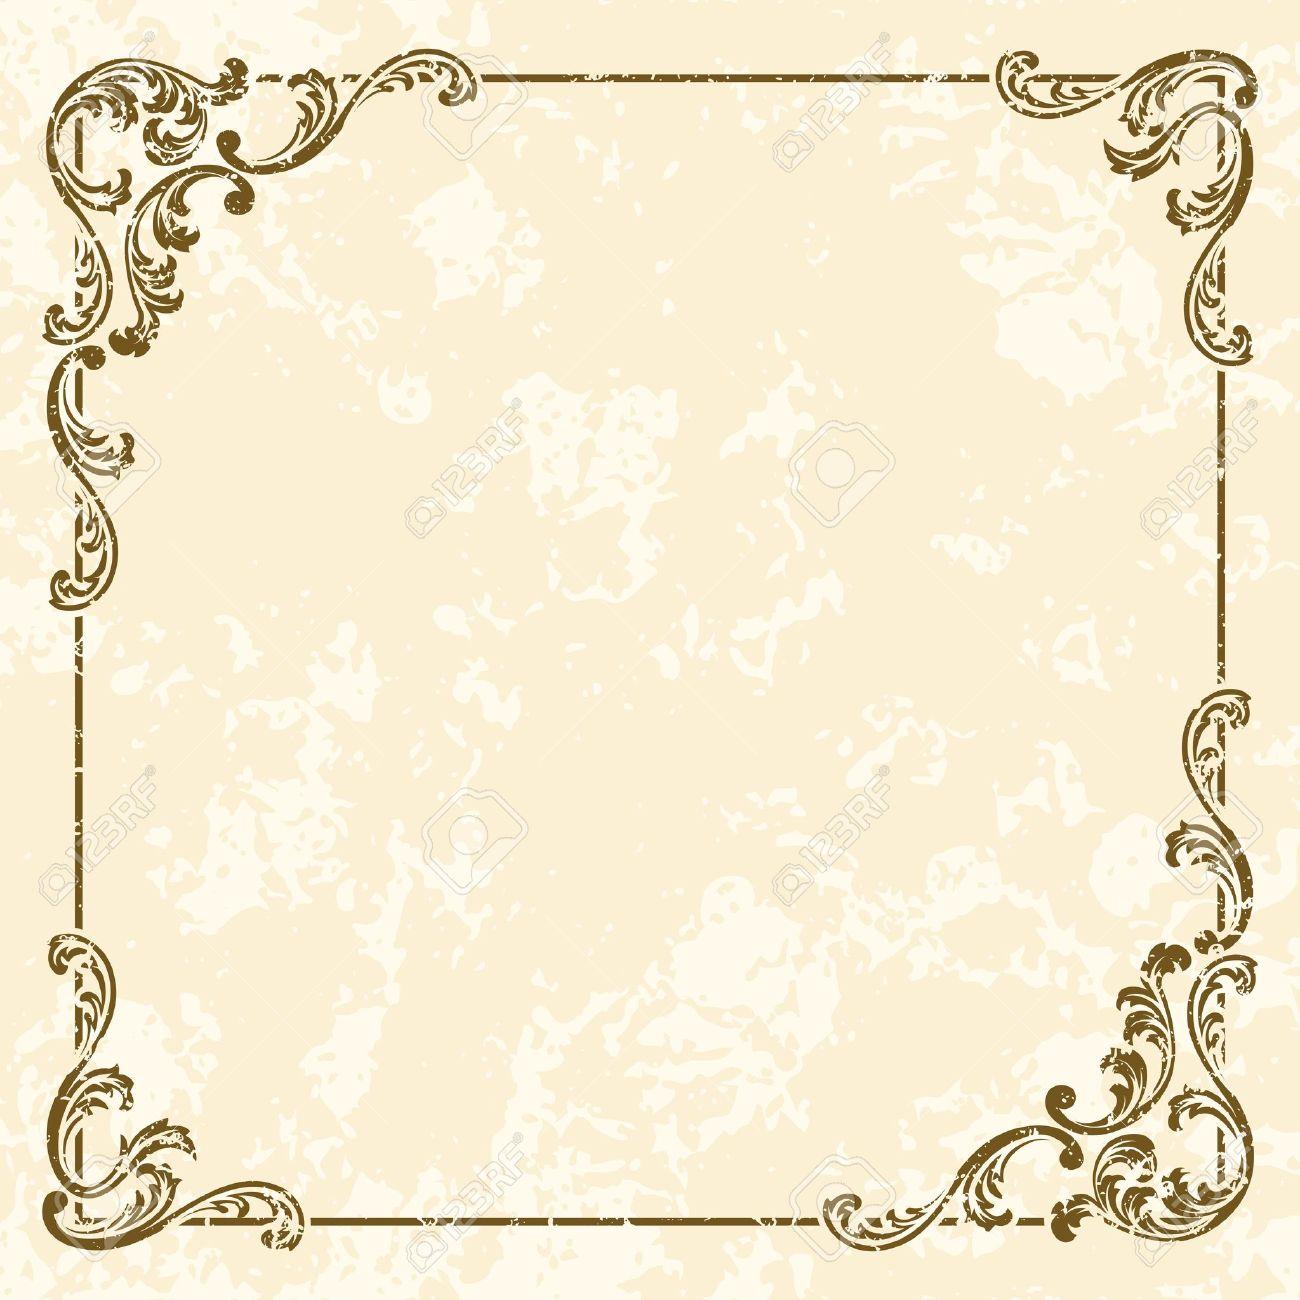 Victorian england design #2